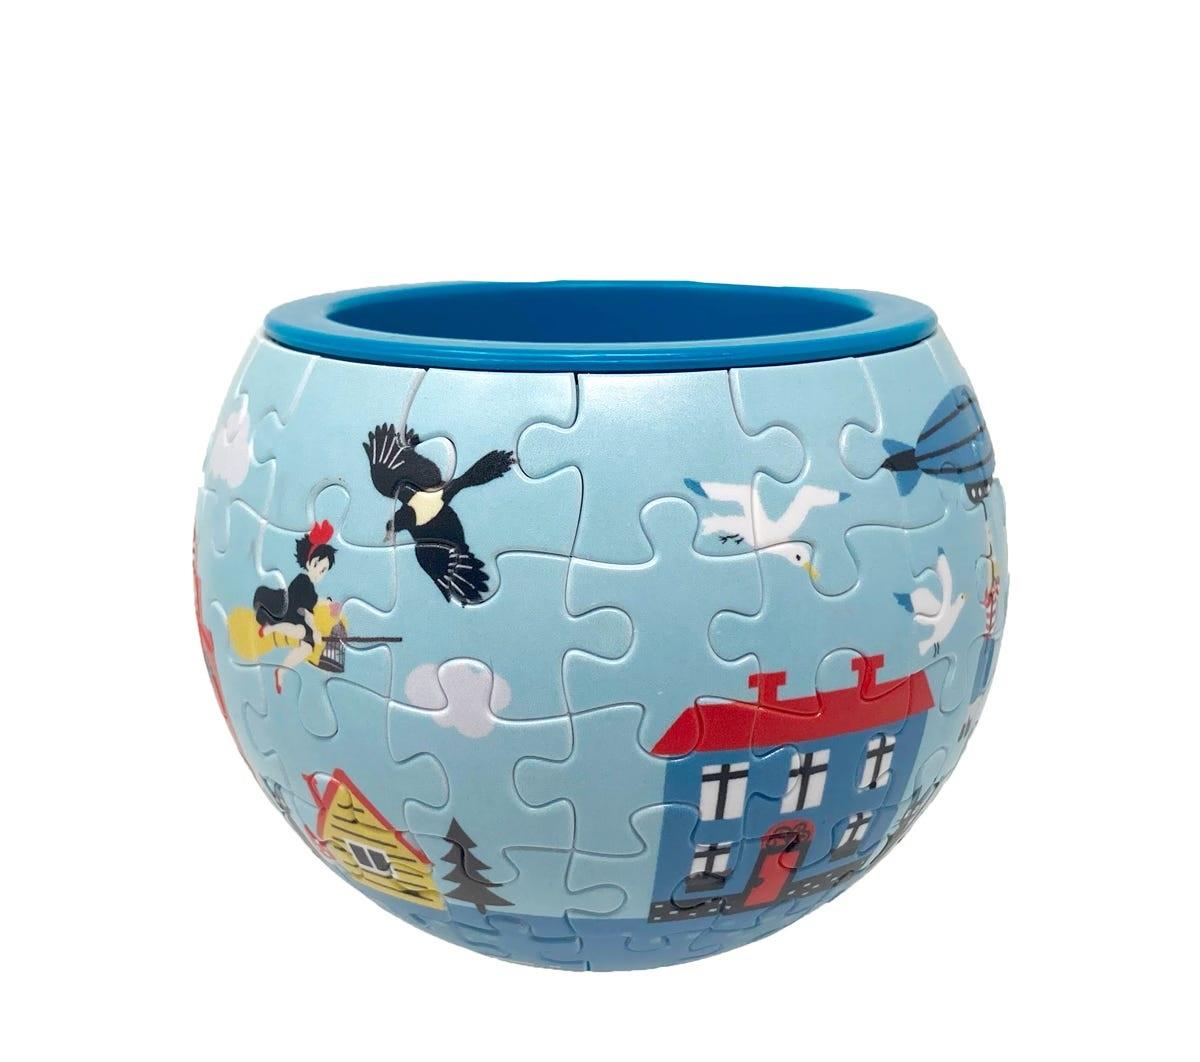 "Ensky Kiki Town of Koriko Puzzle Bowl ""Kiki's Delivery Service"", Ensky Art Bowl Jigsaw"